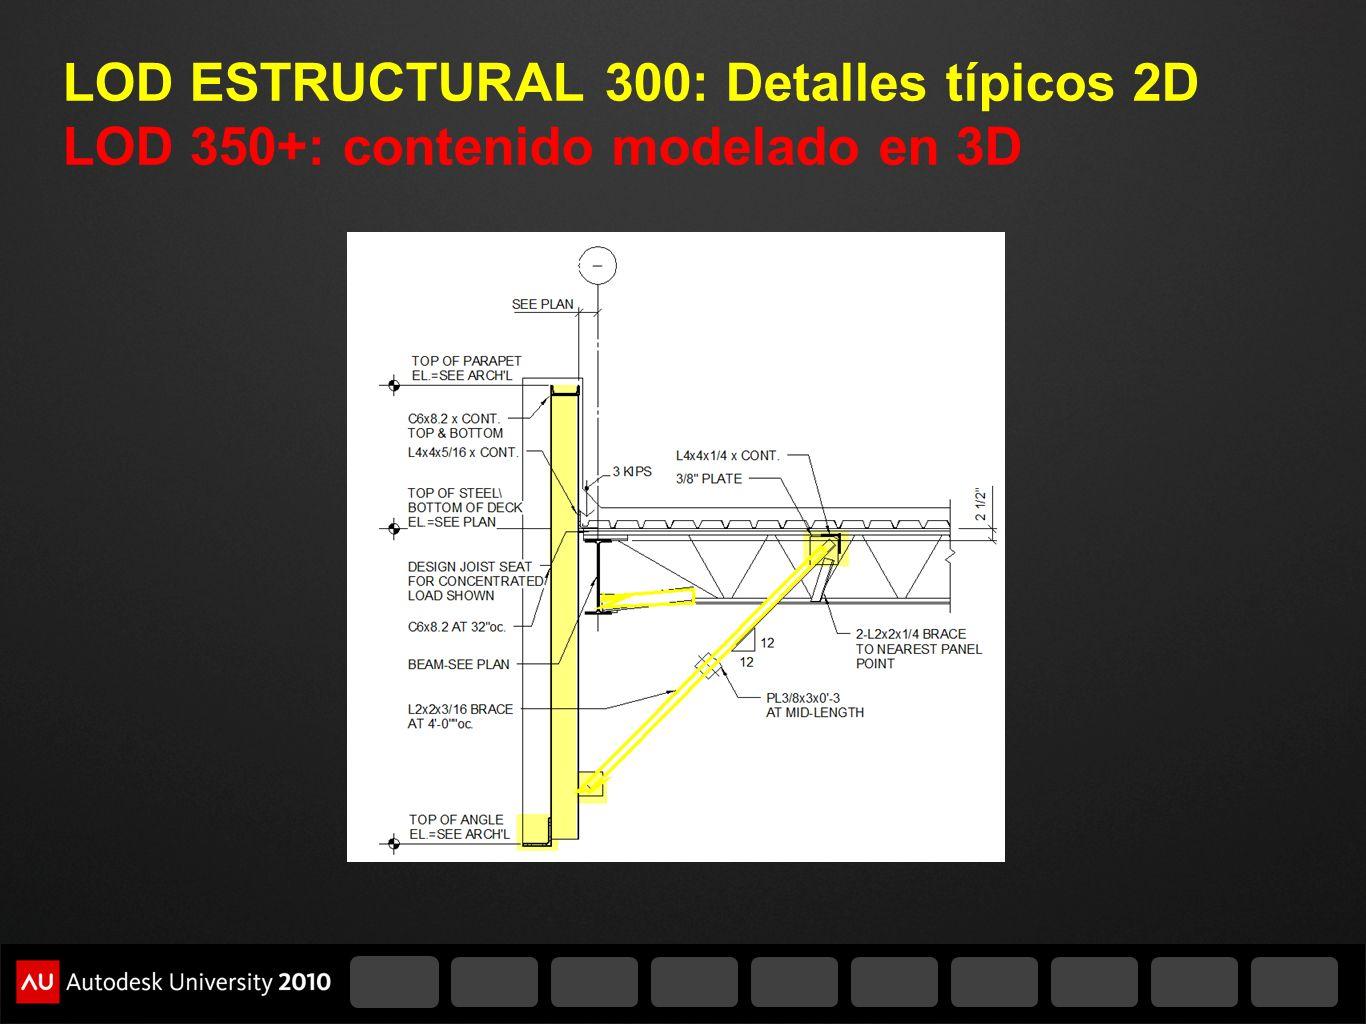 LOD ESTRUCTURAL 300: Detalles típicos 2D LOD 350+: contenido modelado en 3D